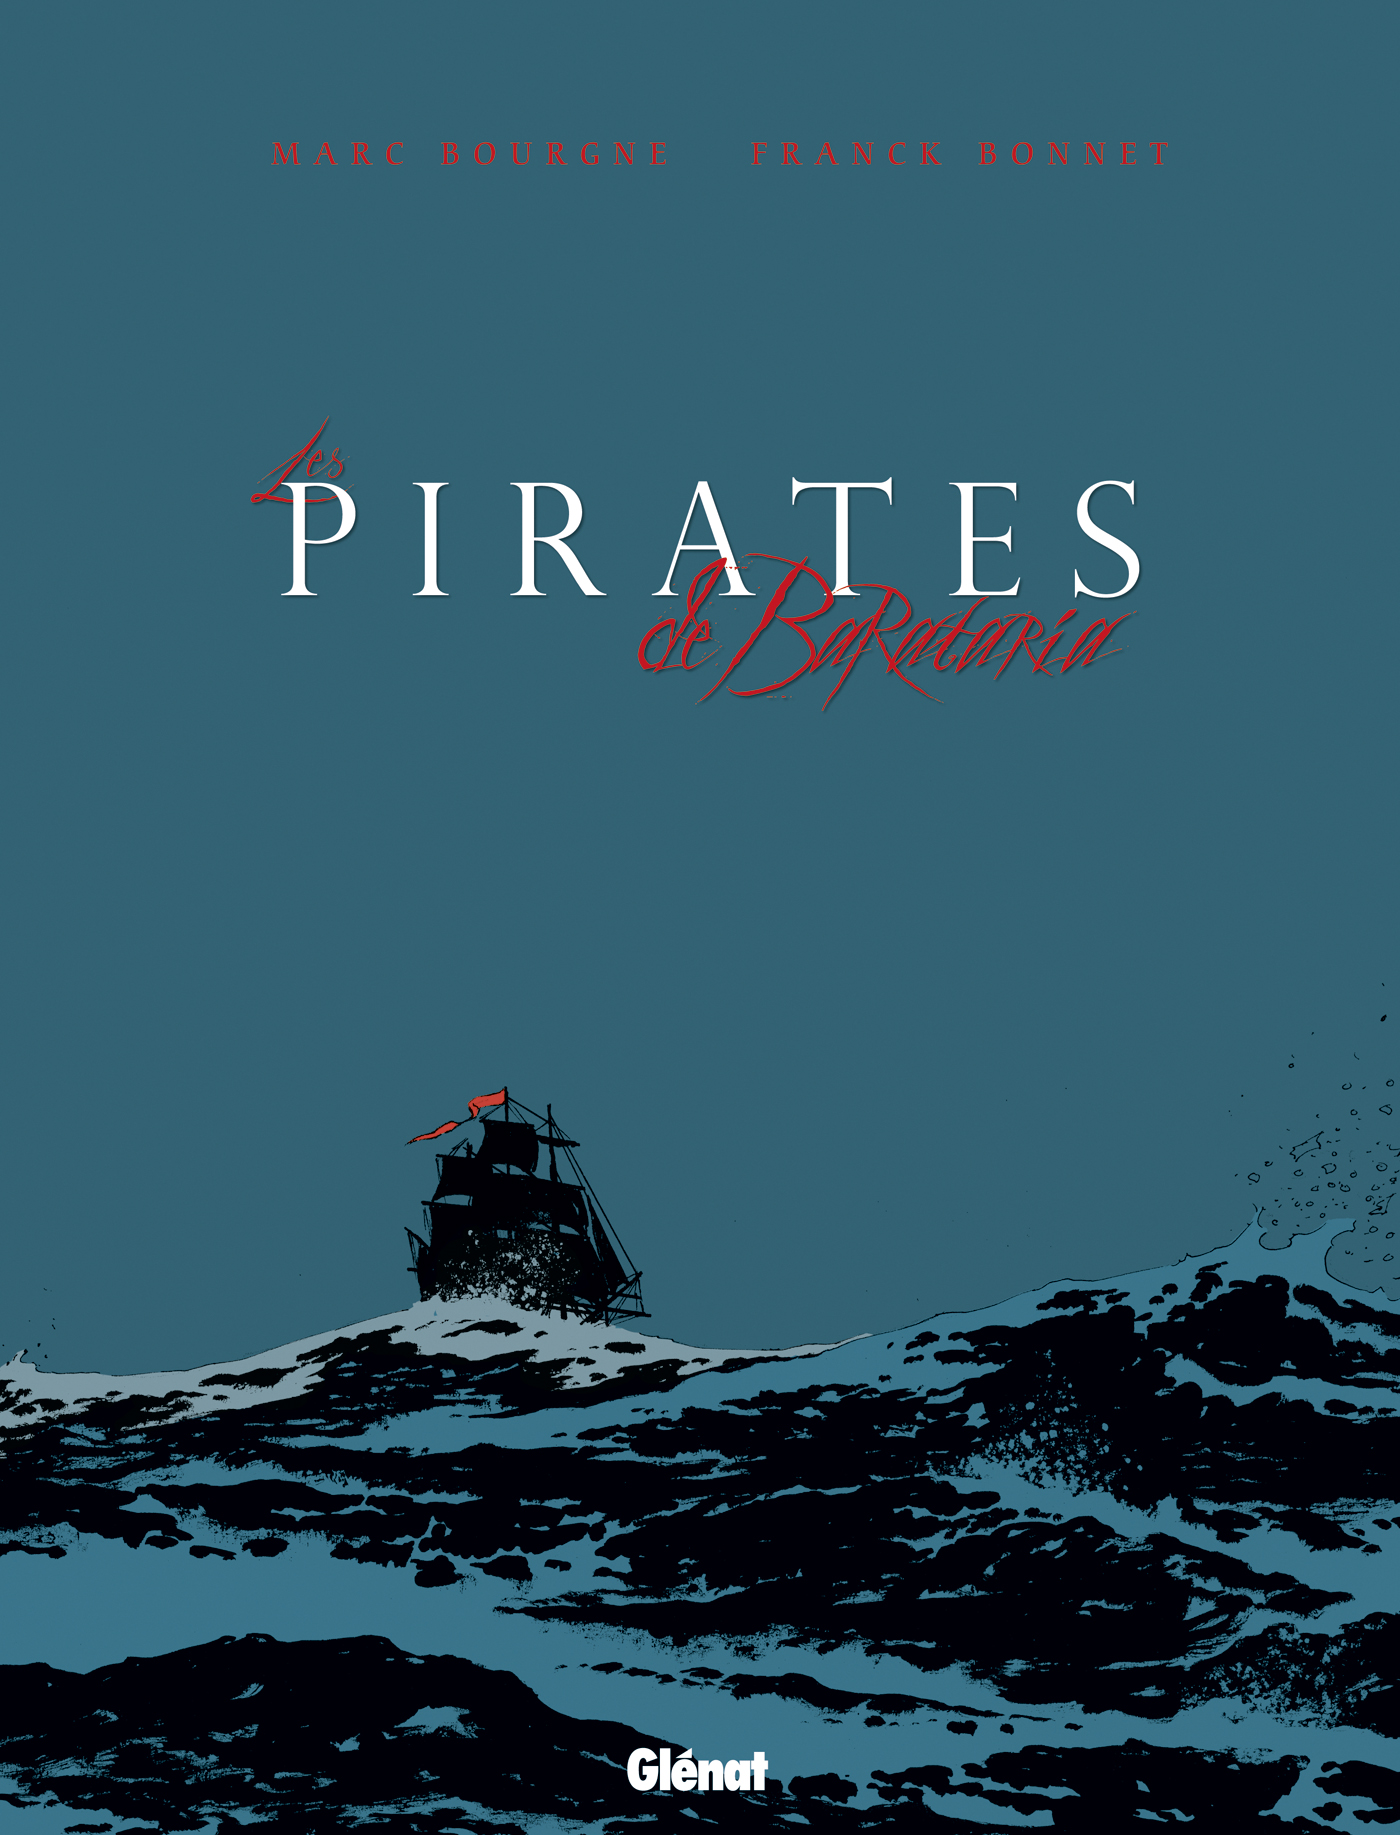 Les pirates de Barataria 1 -  Les Pirates de Barataria - Coffret Premier Cycle